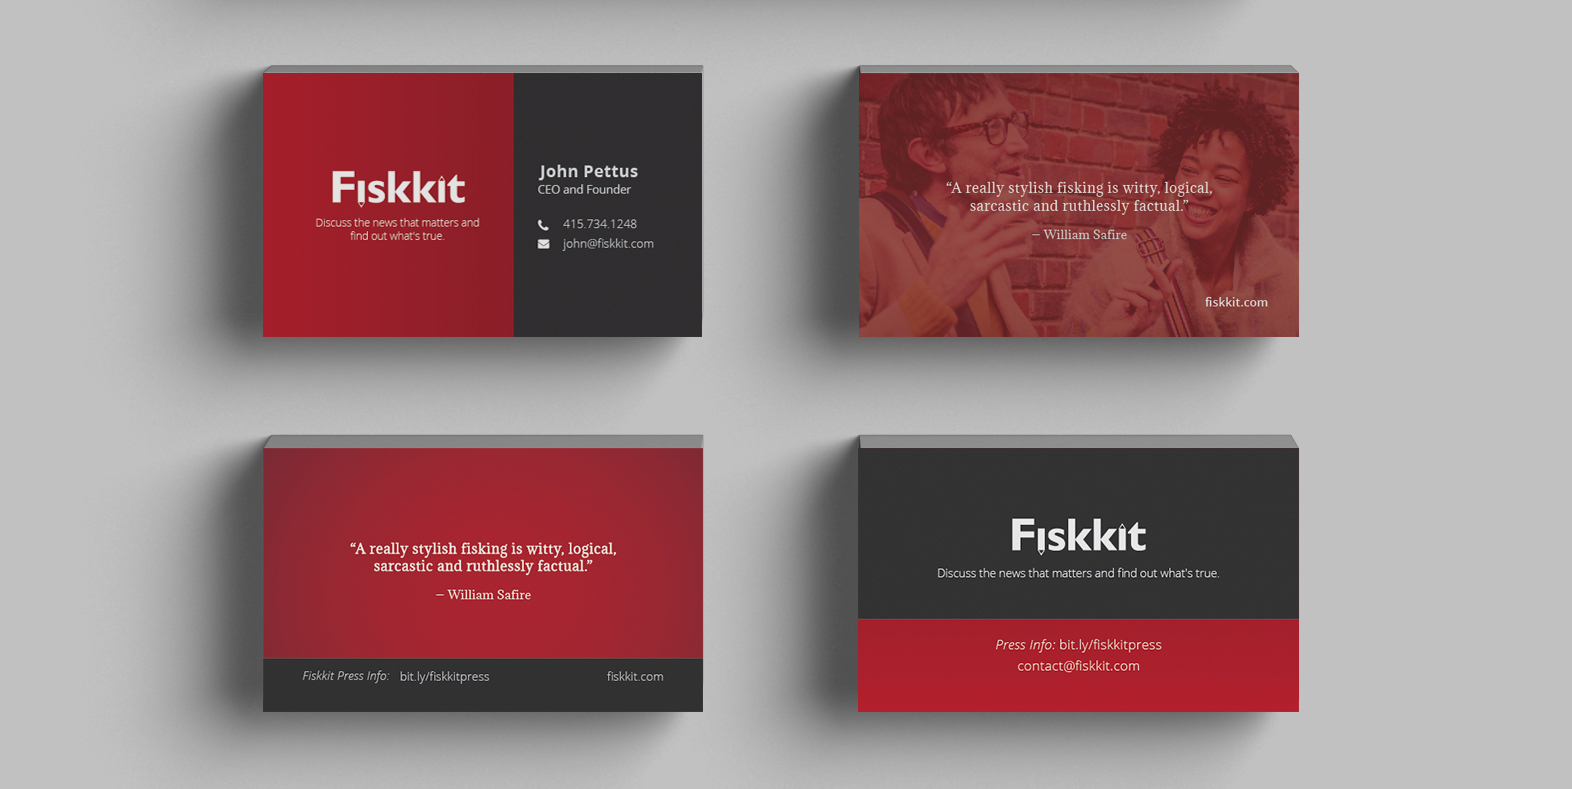 Fiskkit-Cards copy.jpg